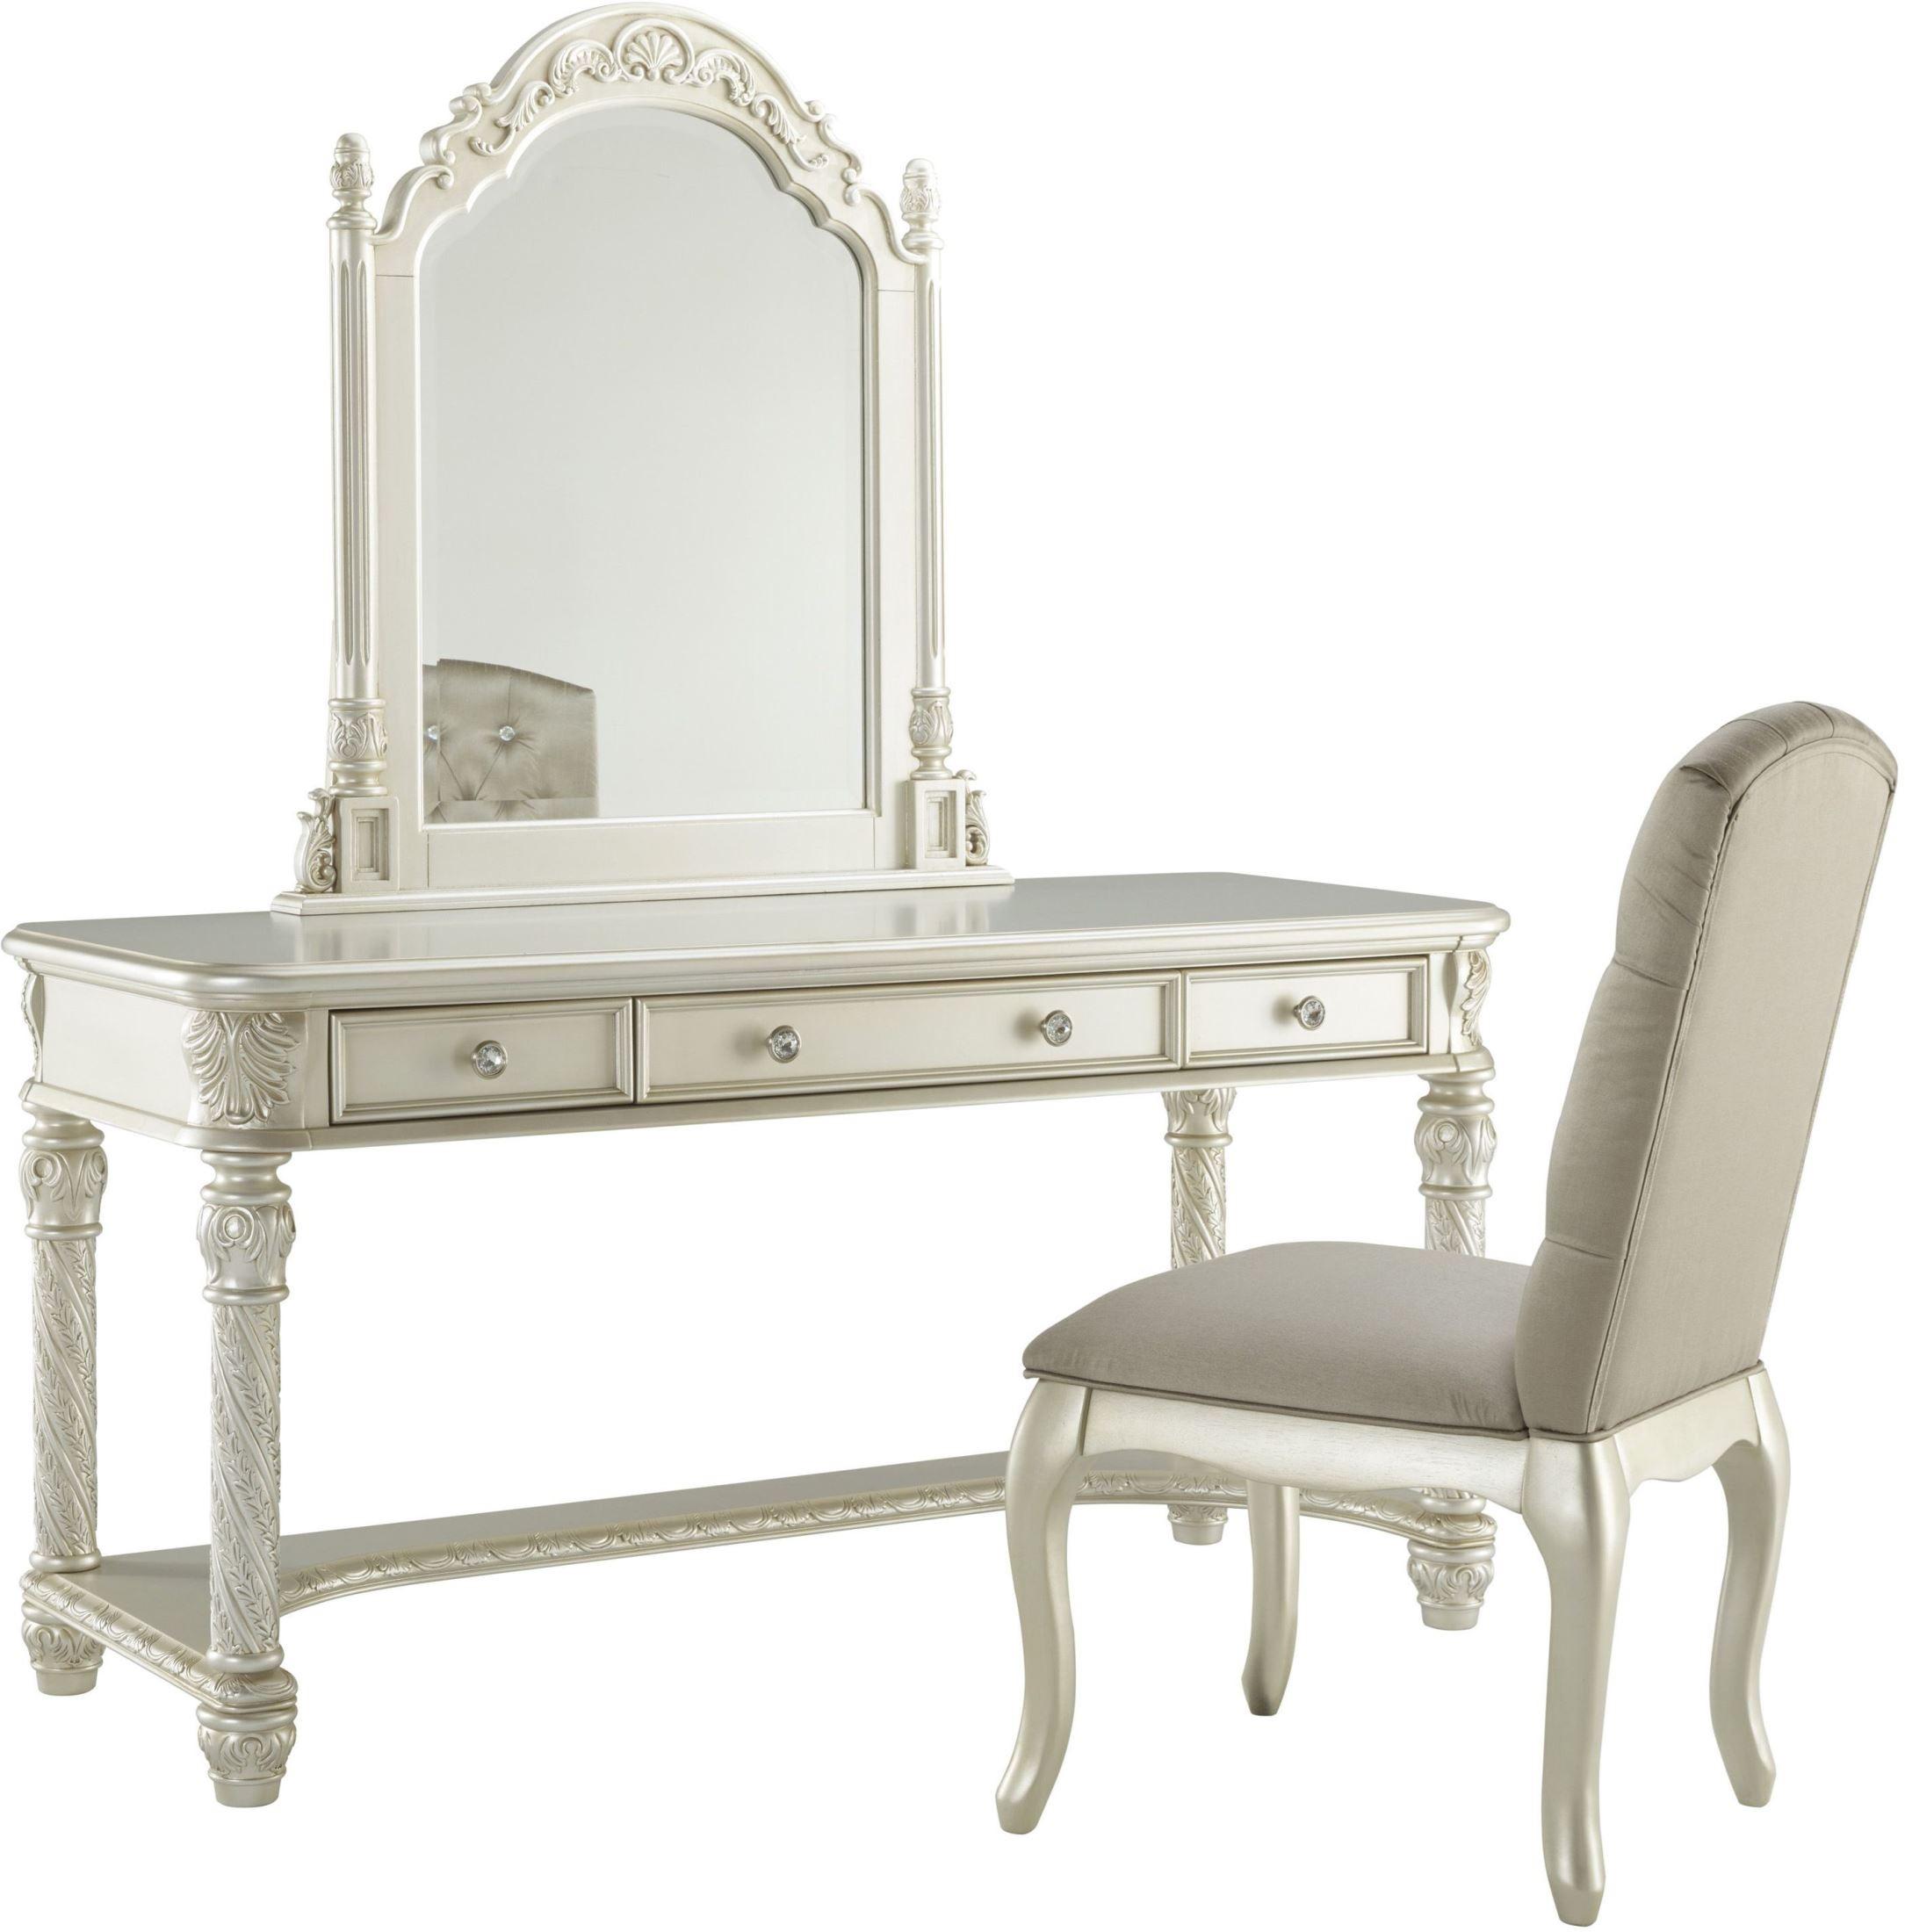 Discounts on Bedroom Vanity Tables